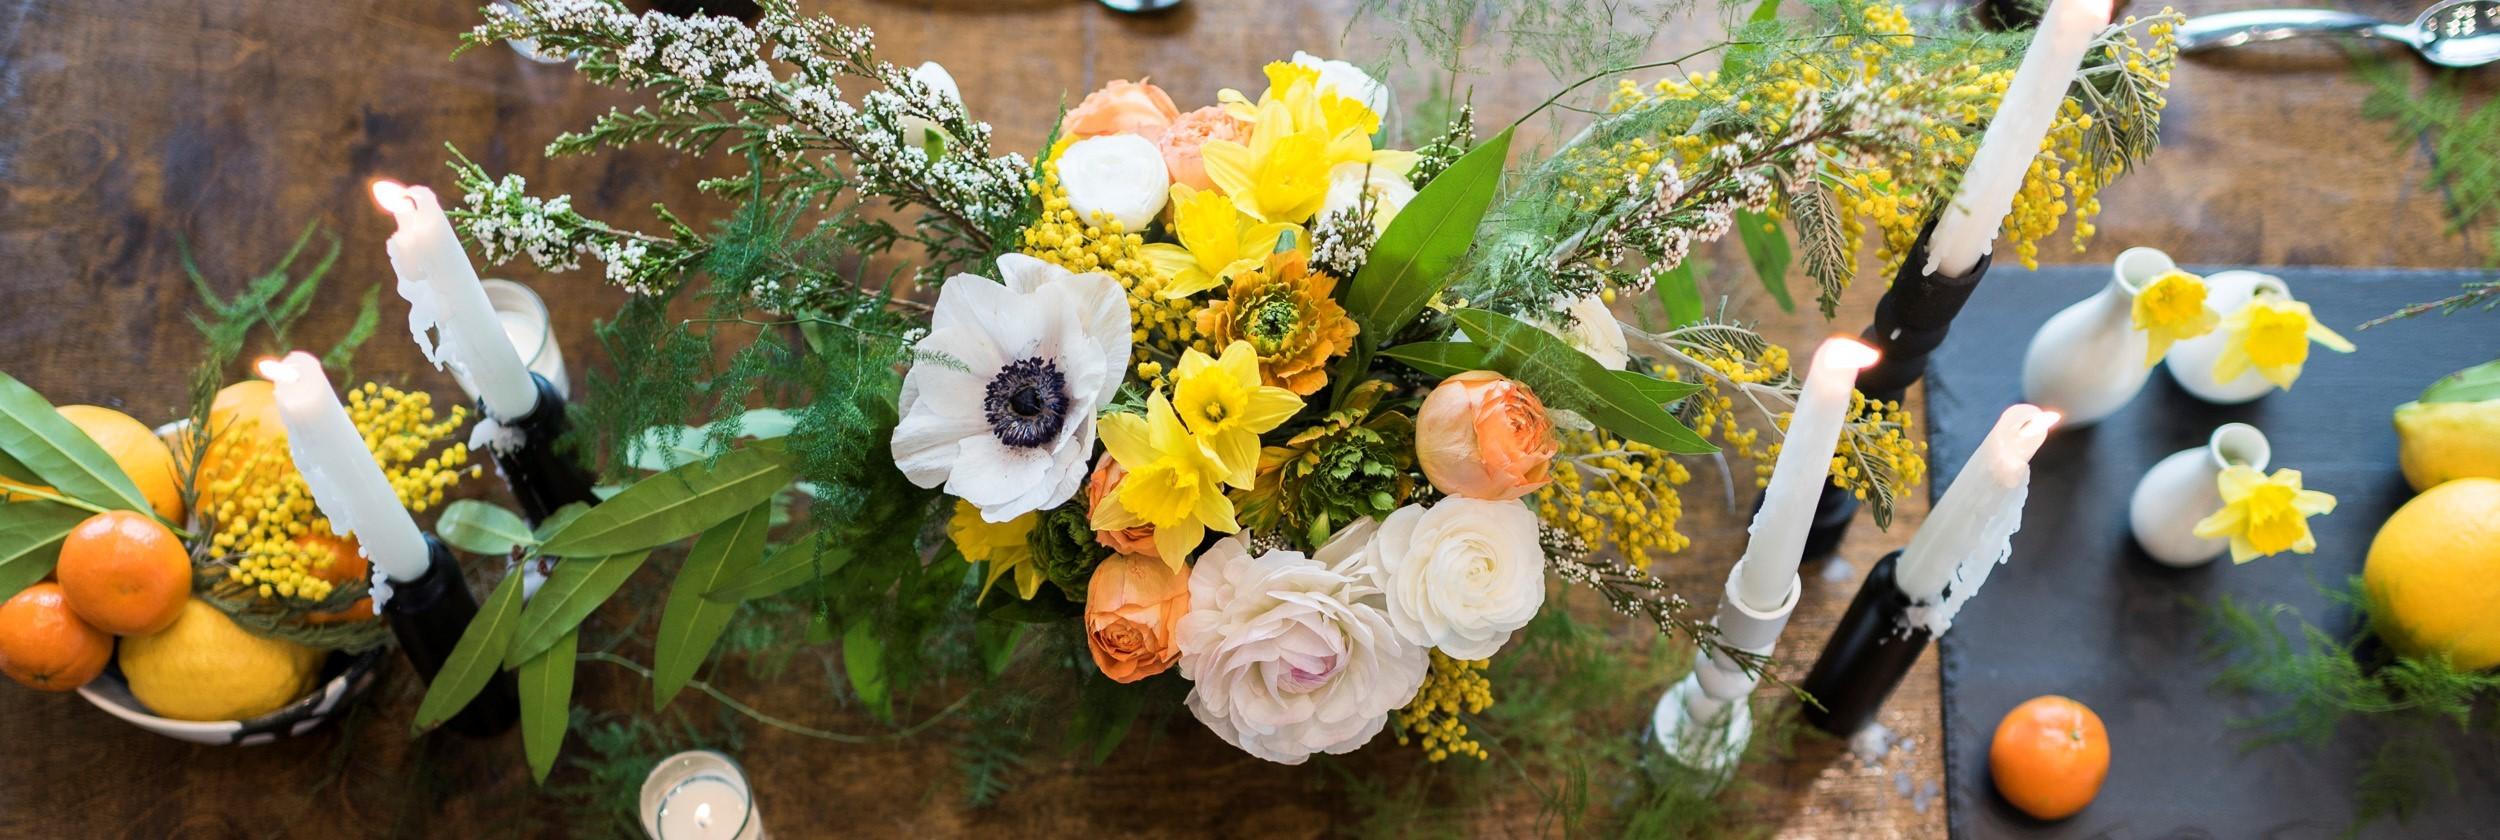 Golden Poppy Events - Golden Poppy Events